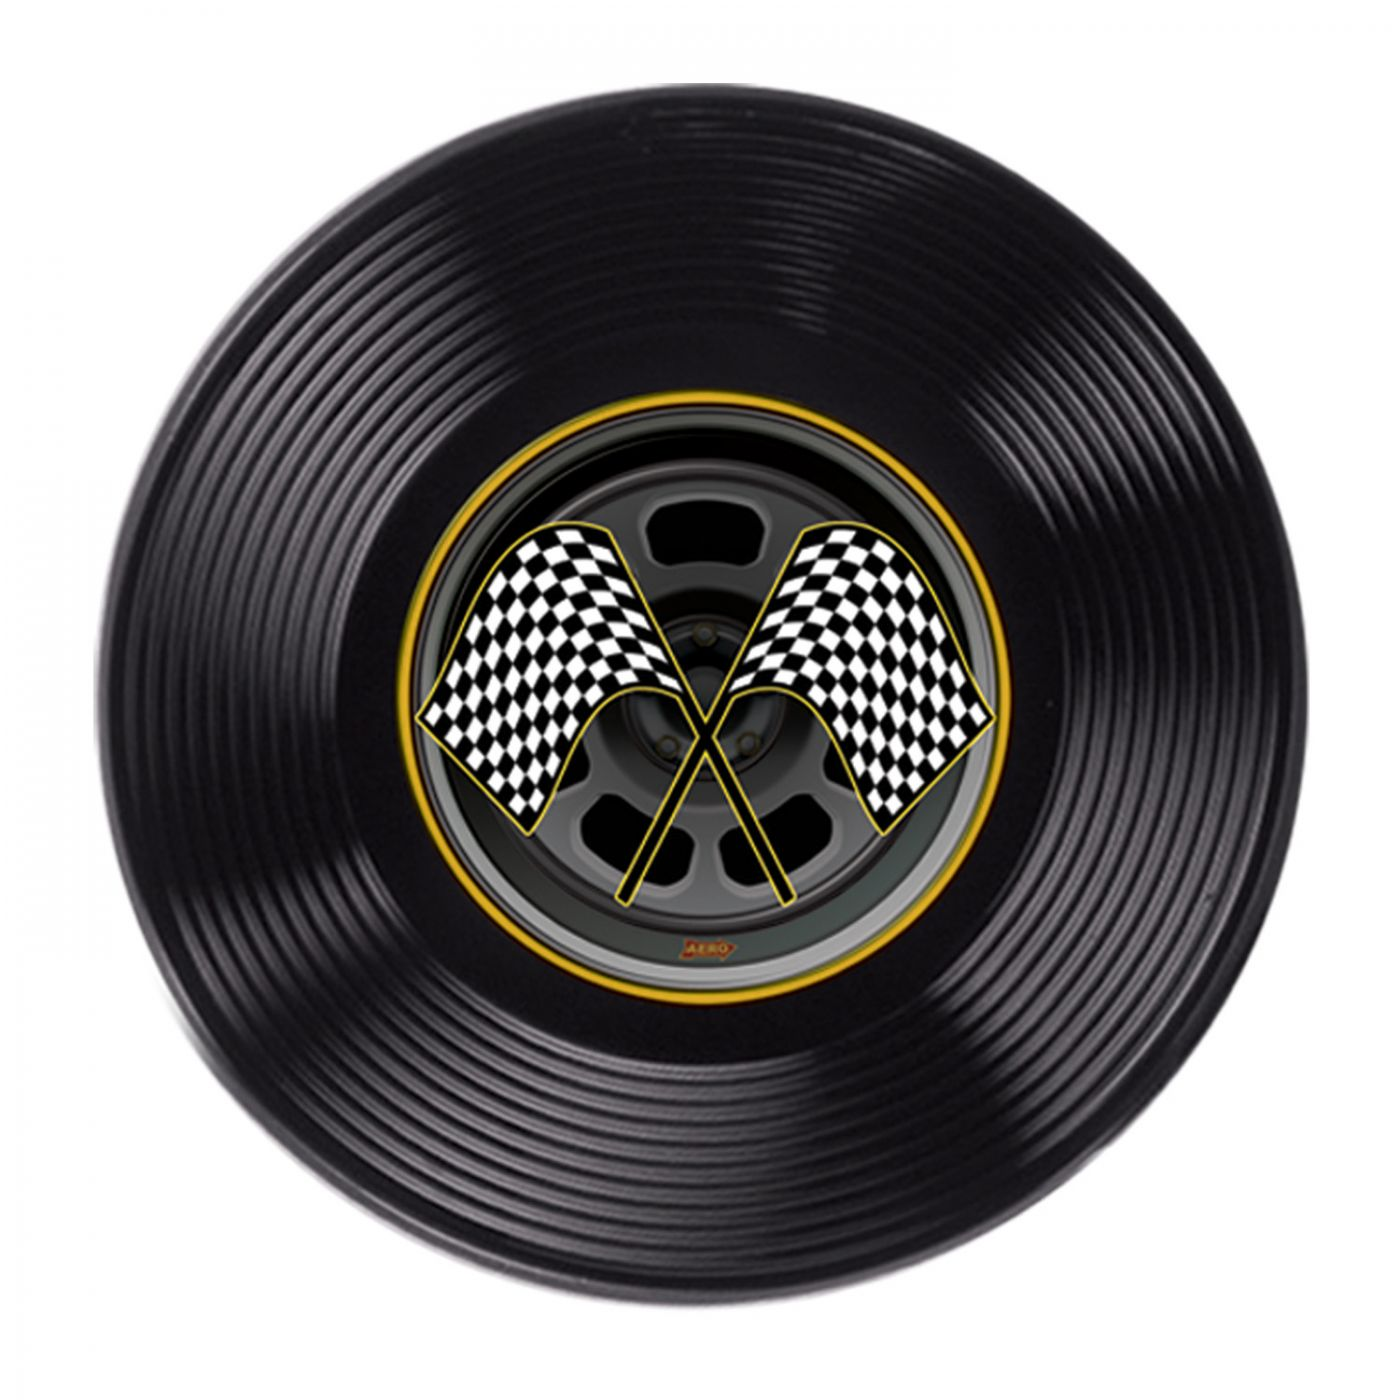 Plastic Racing Tire image